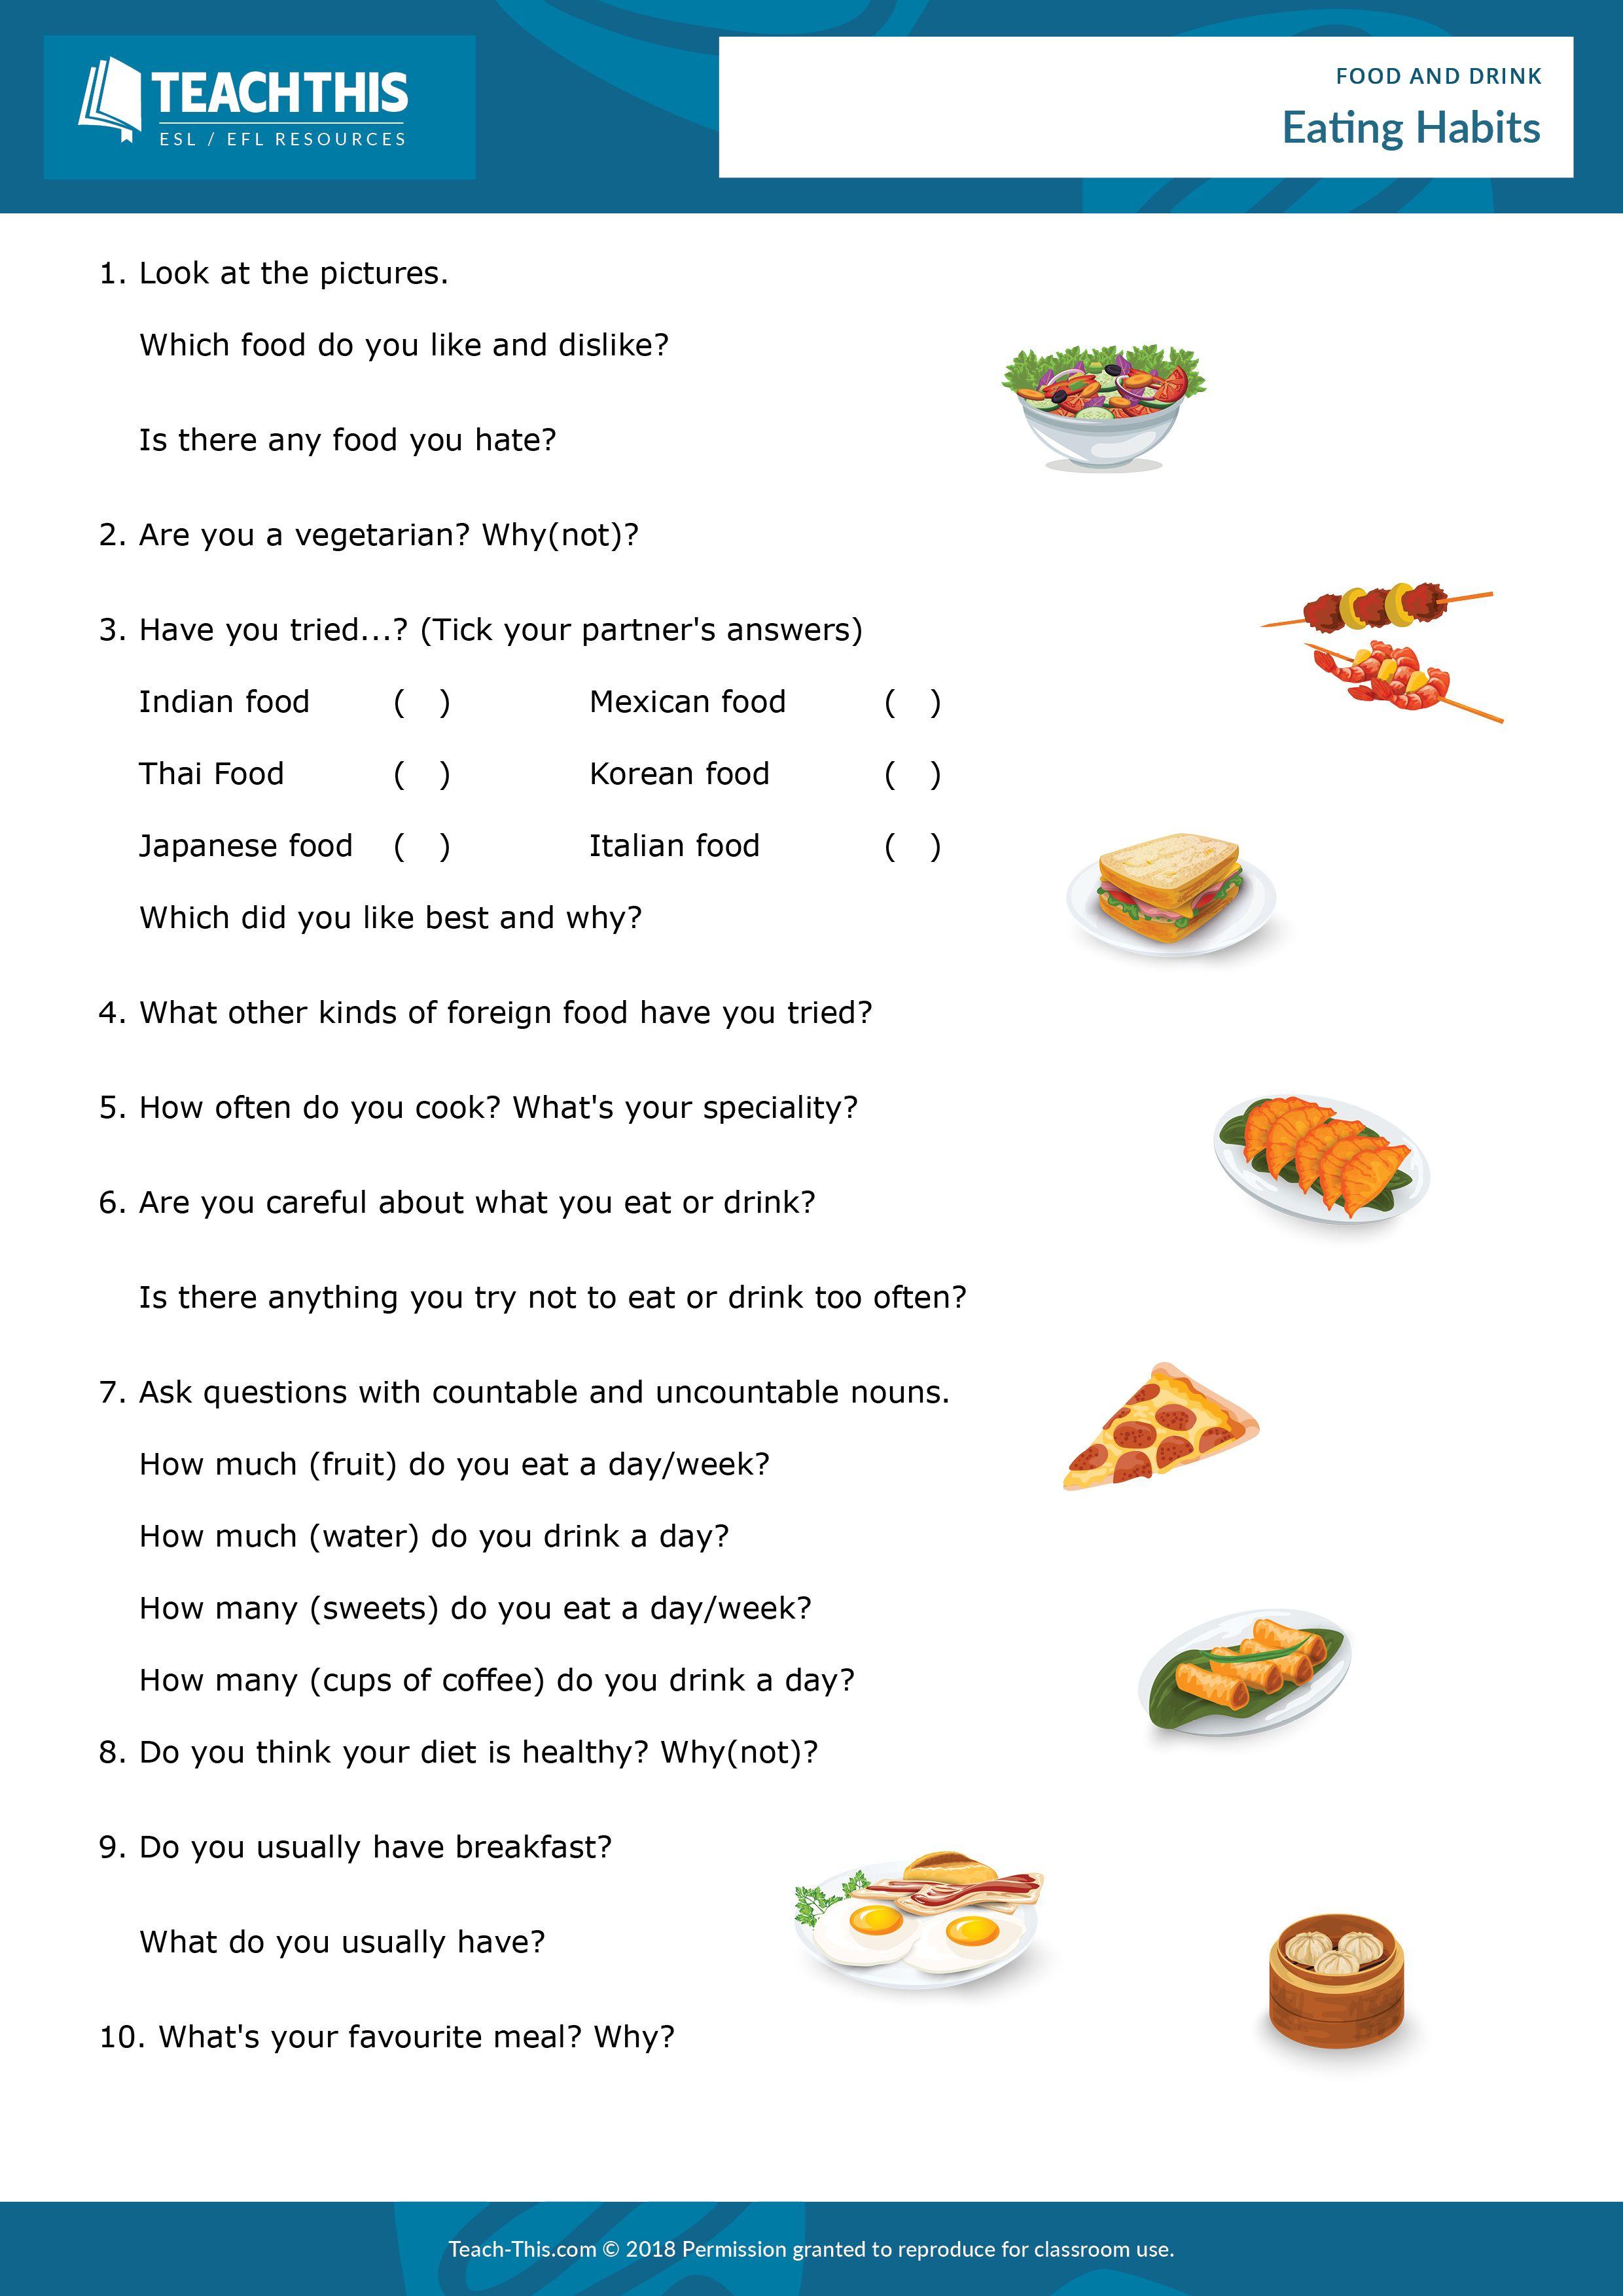 Food and Drink Eating habits, Food drink, Food